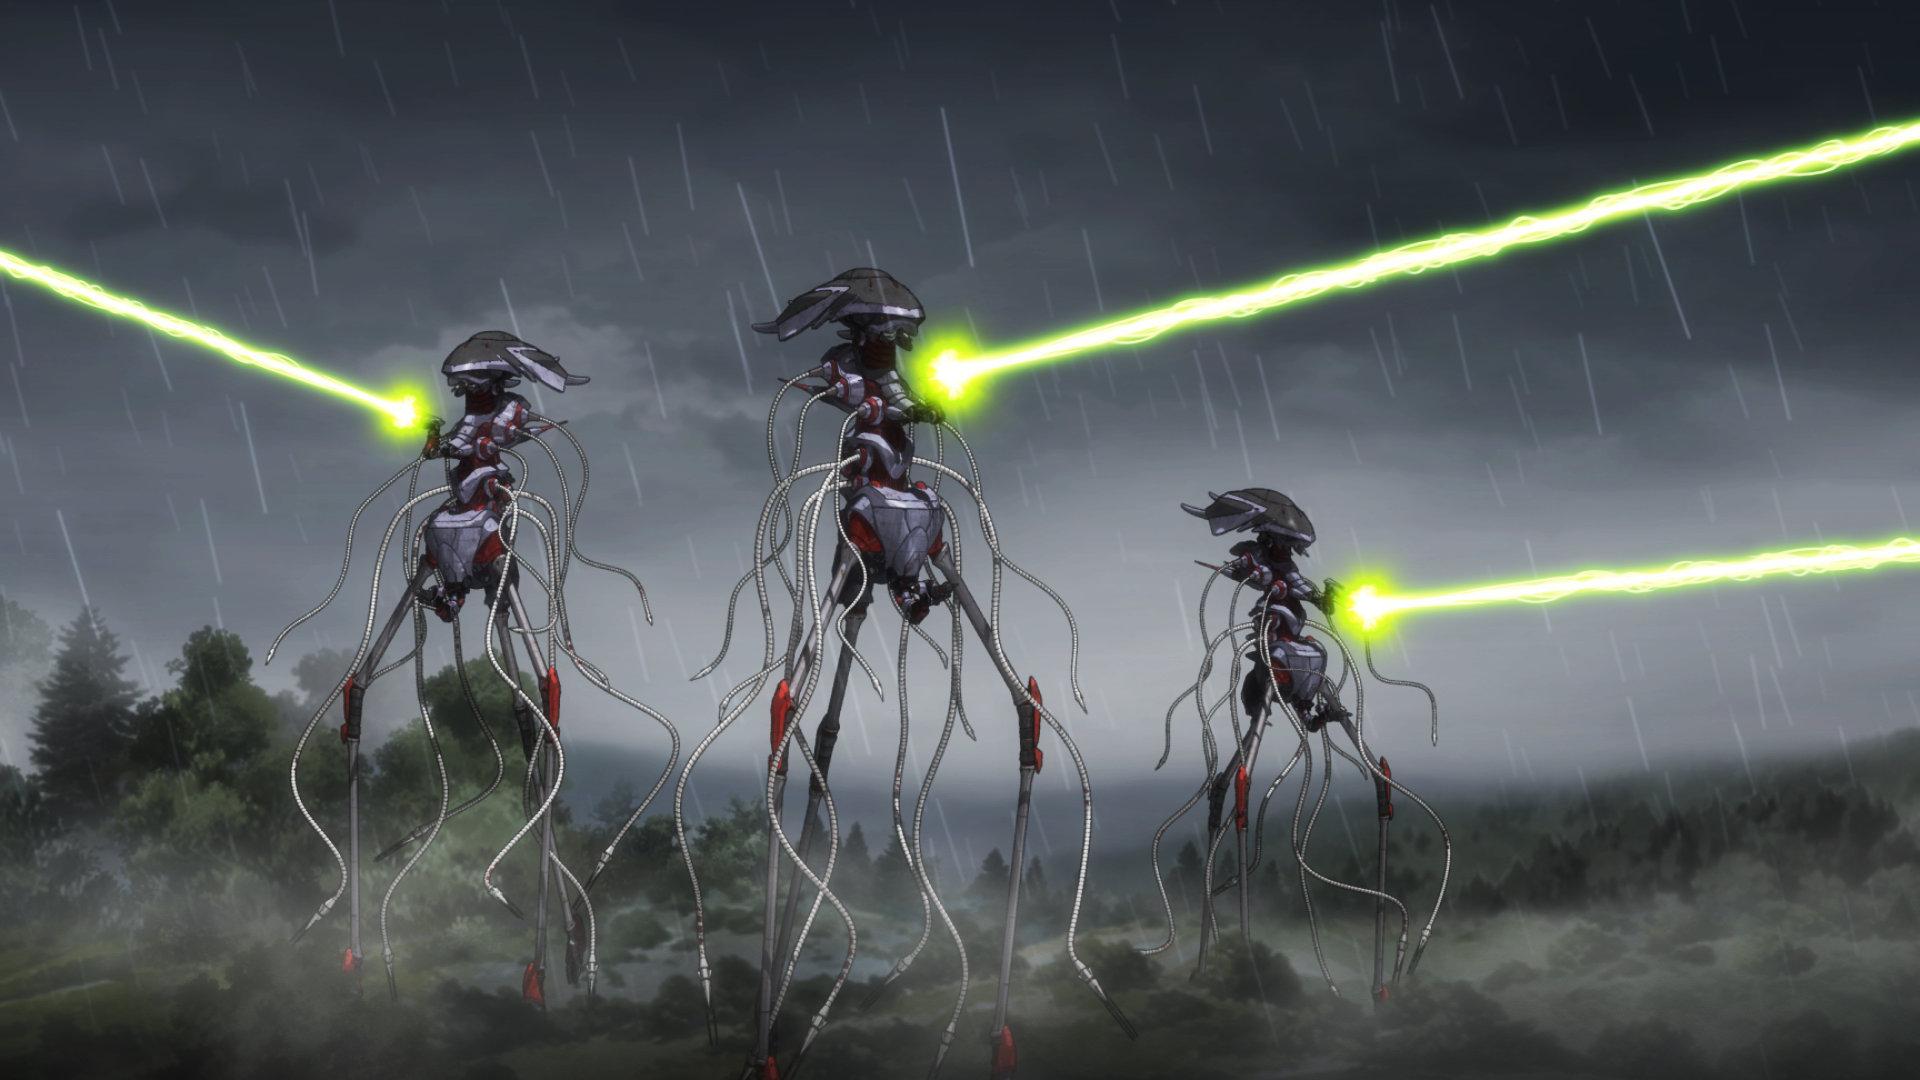 The Martian war machnes in War of the Worlds: Goliath (2012)